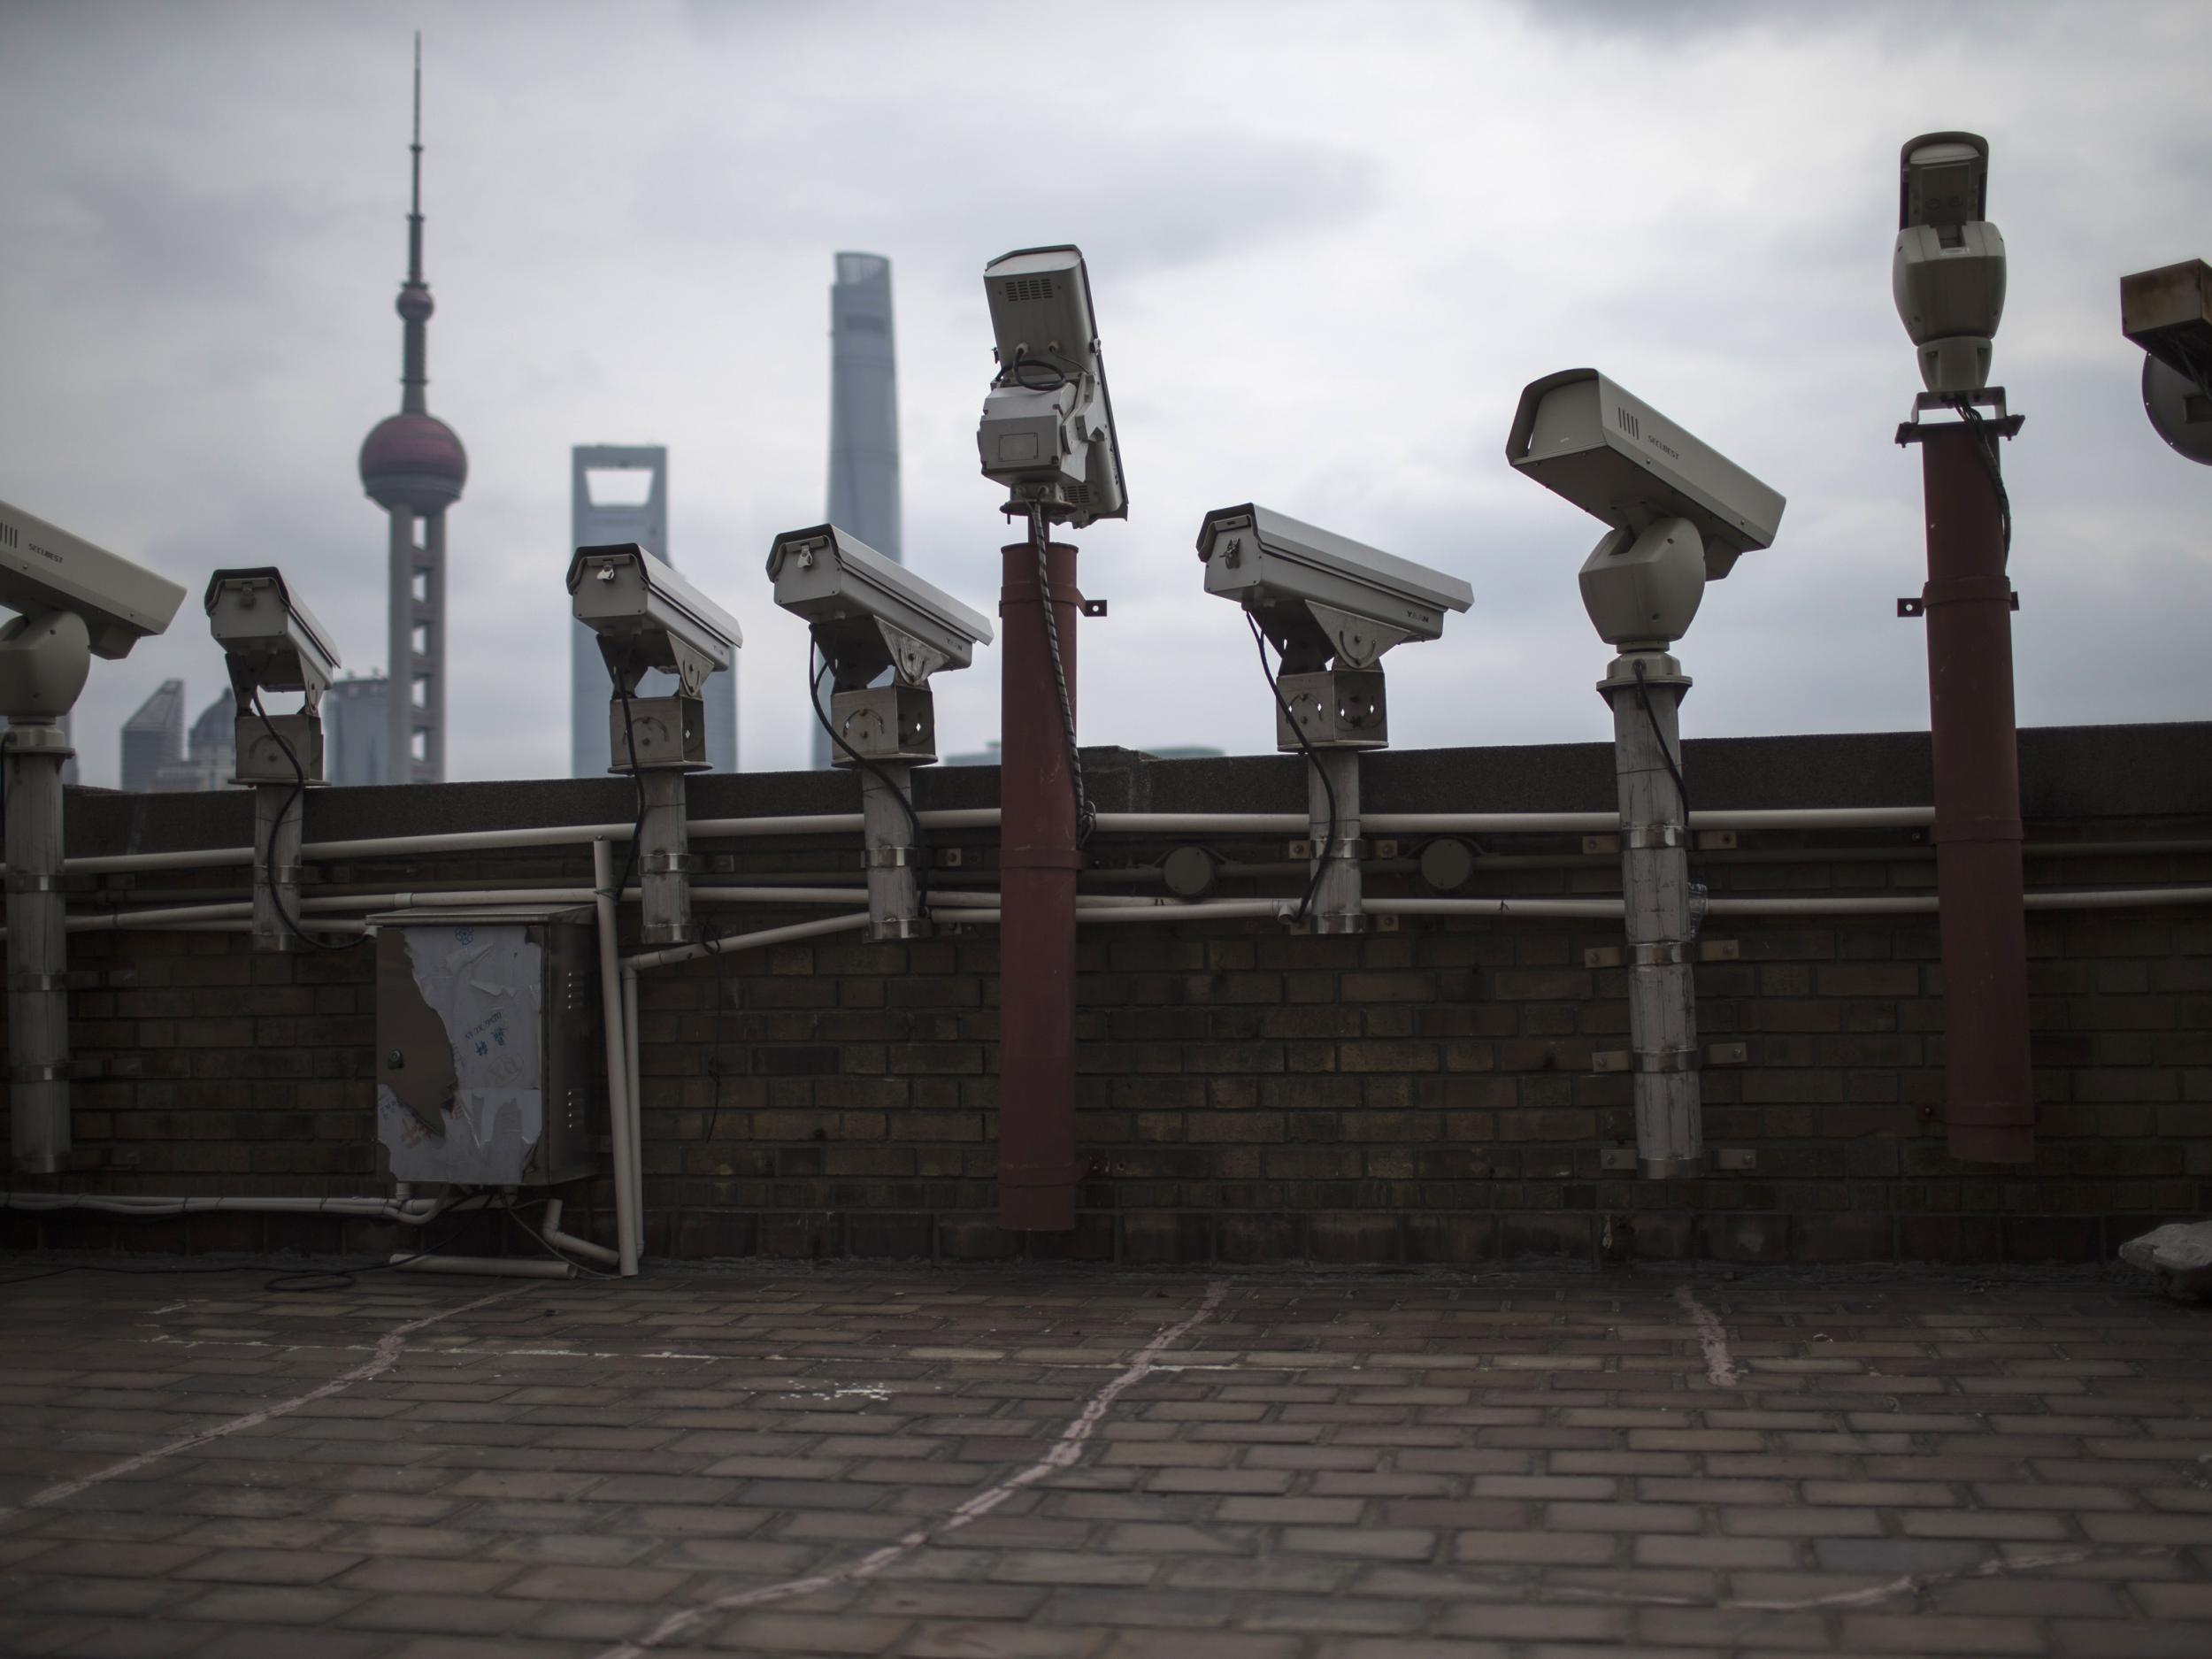 China testing facial recognition technology in Muslim region of Xinjiang